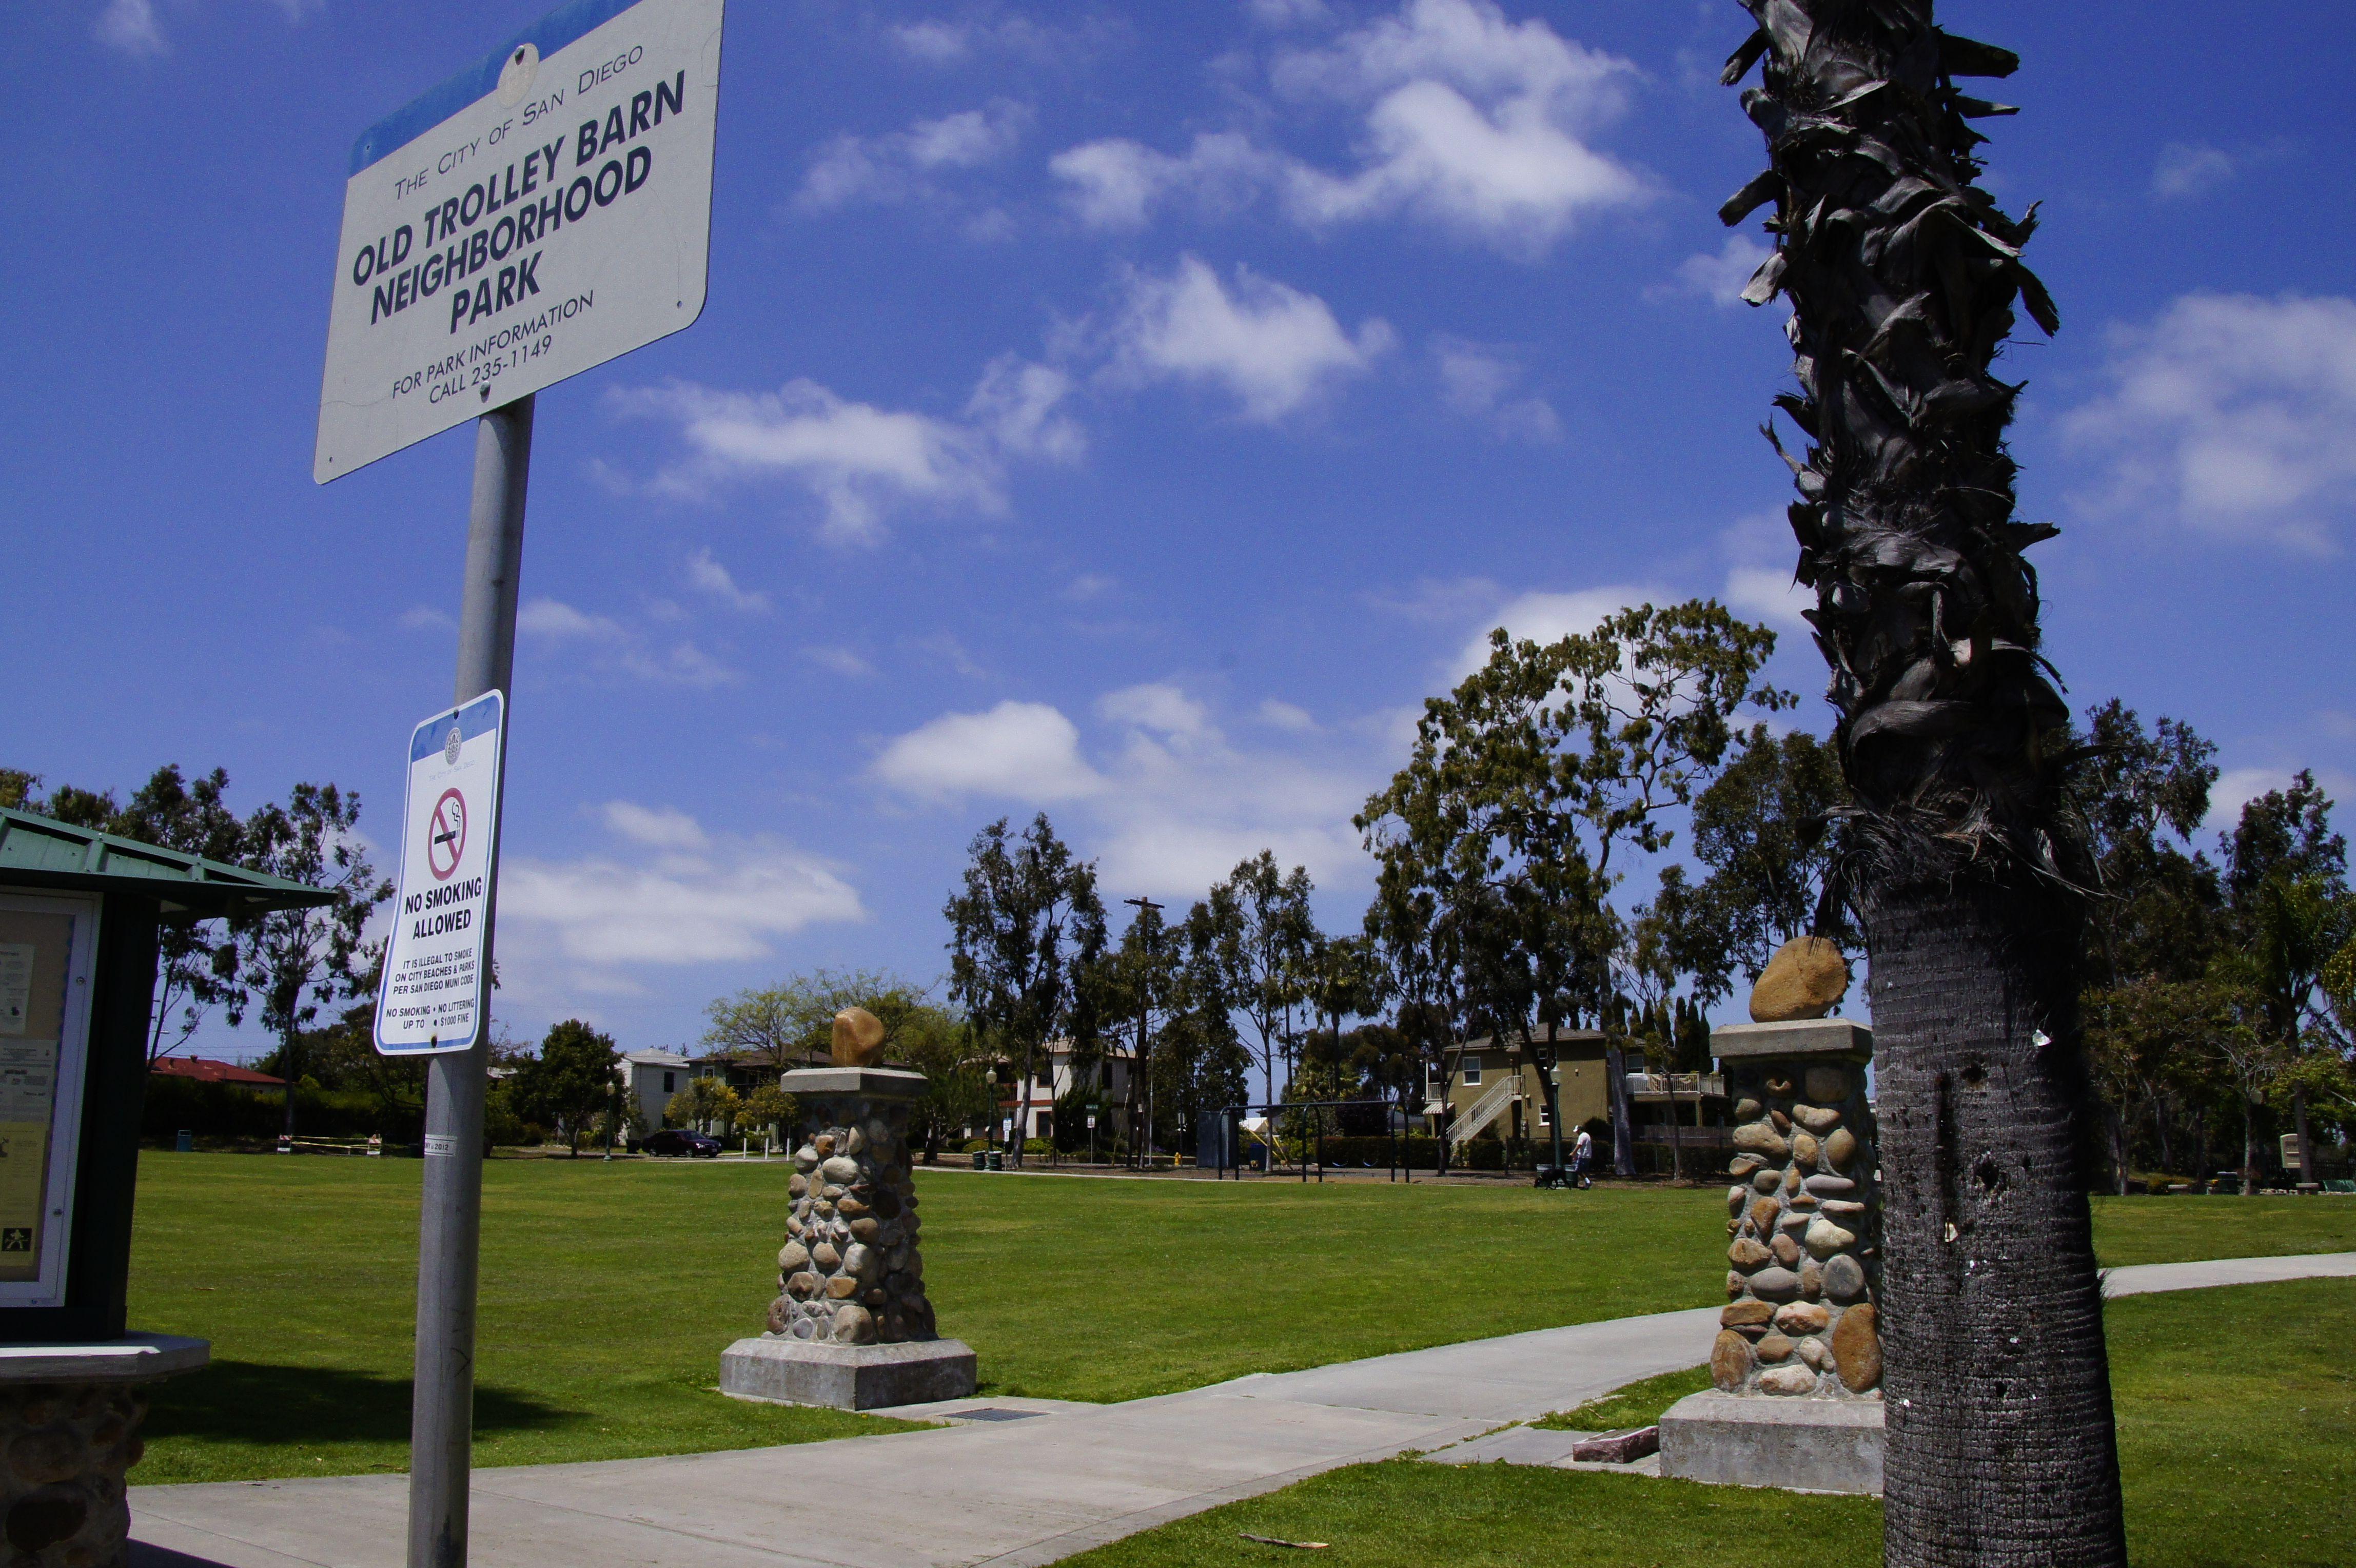 Old Trolley Barn Park On Adams Avenue In University Heights San Diego